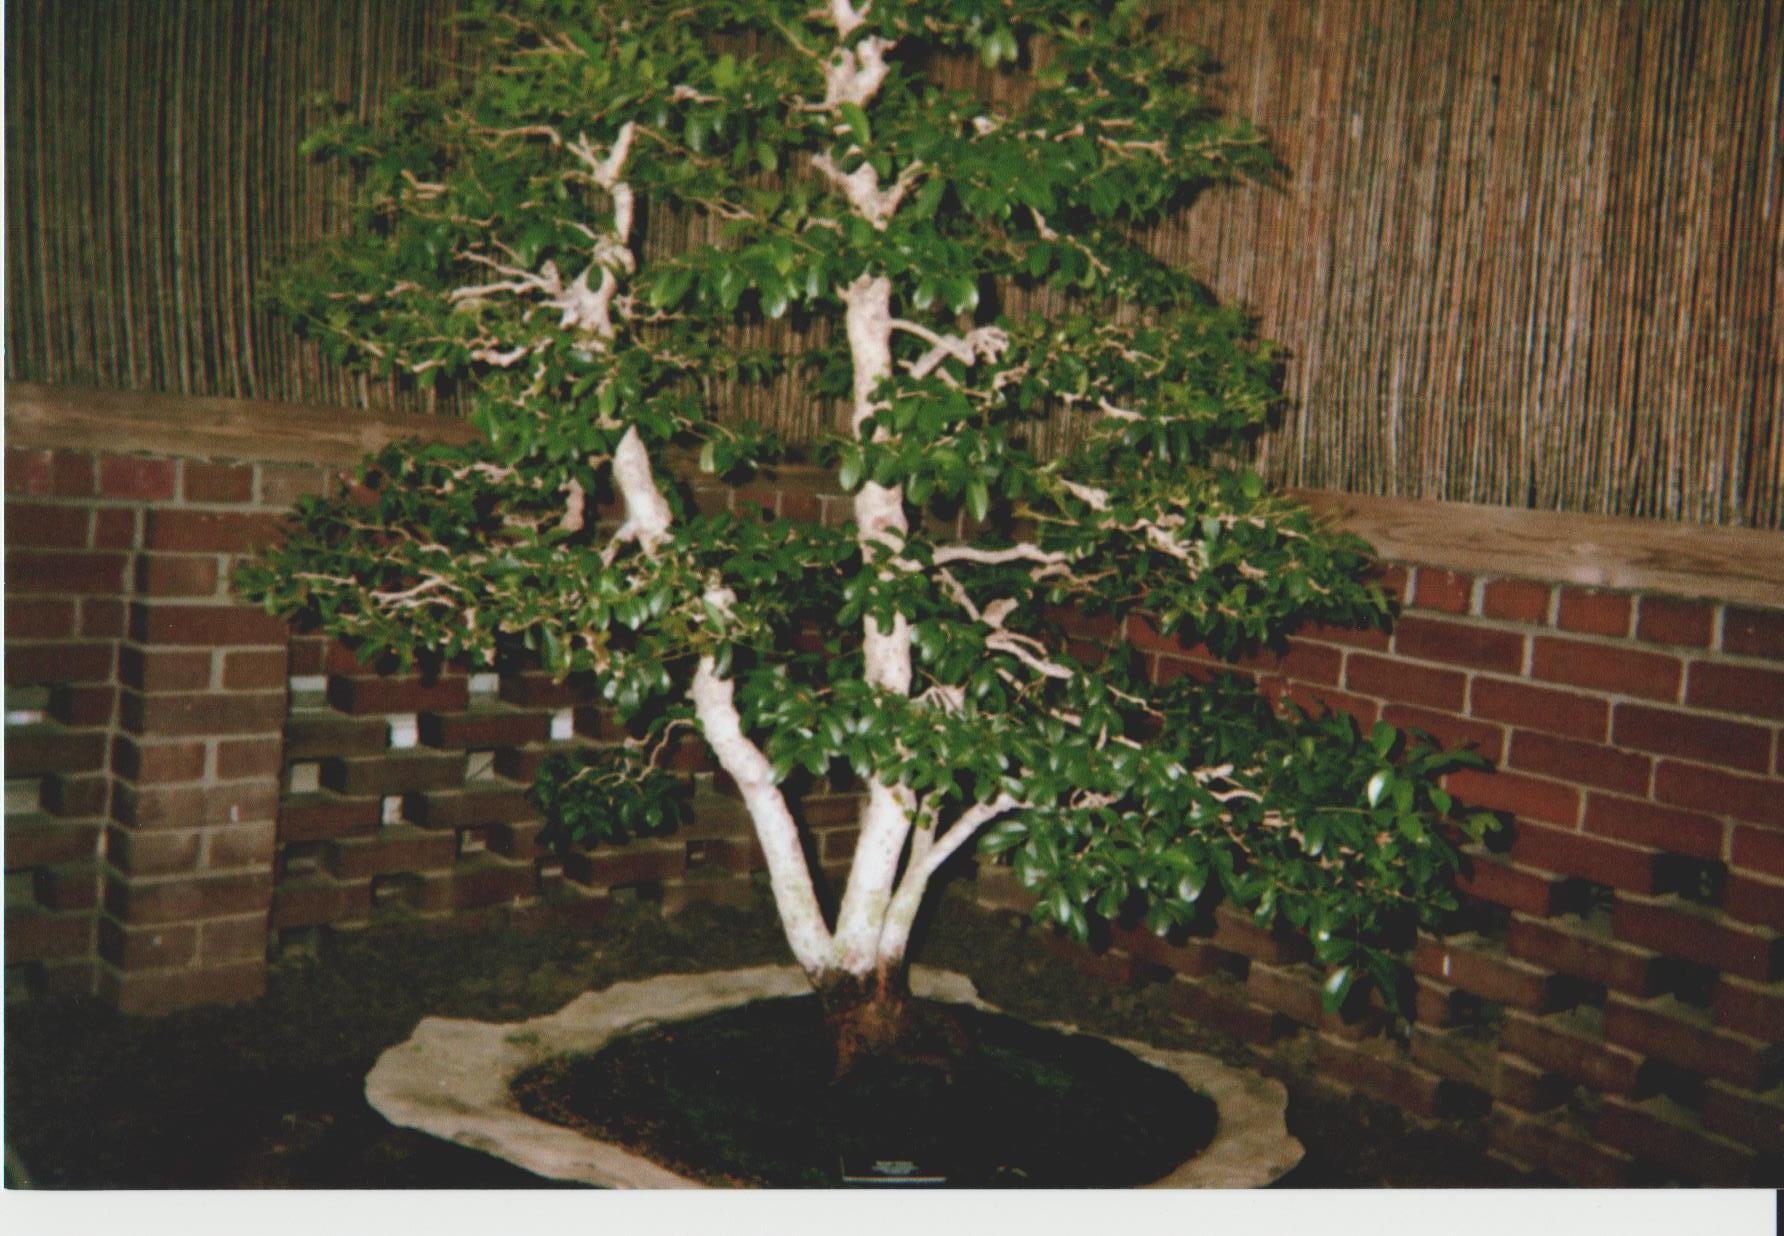 Lrg. Bonsai Tree